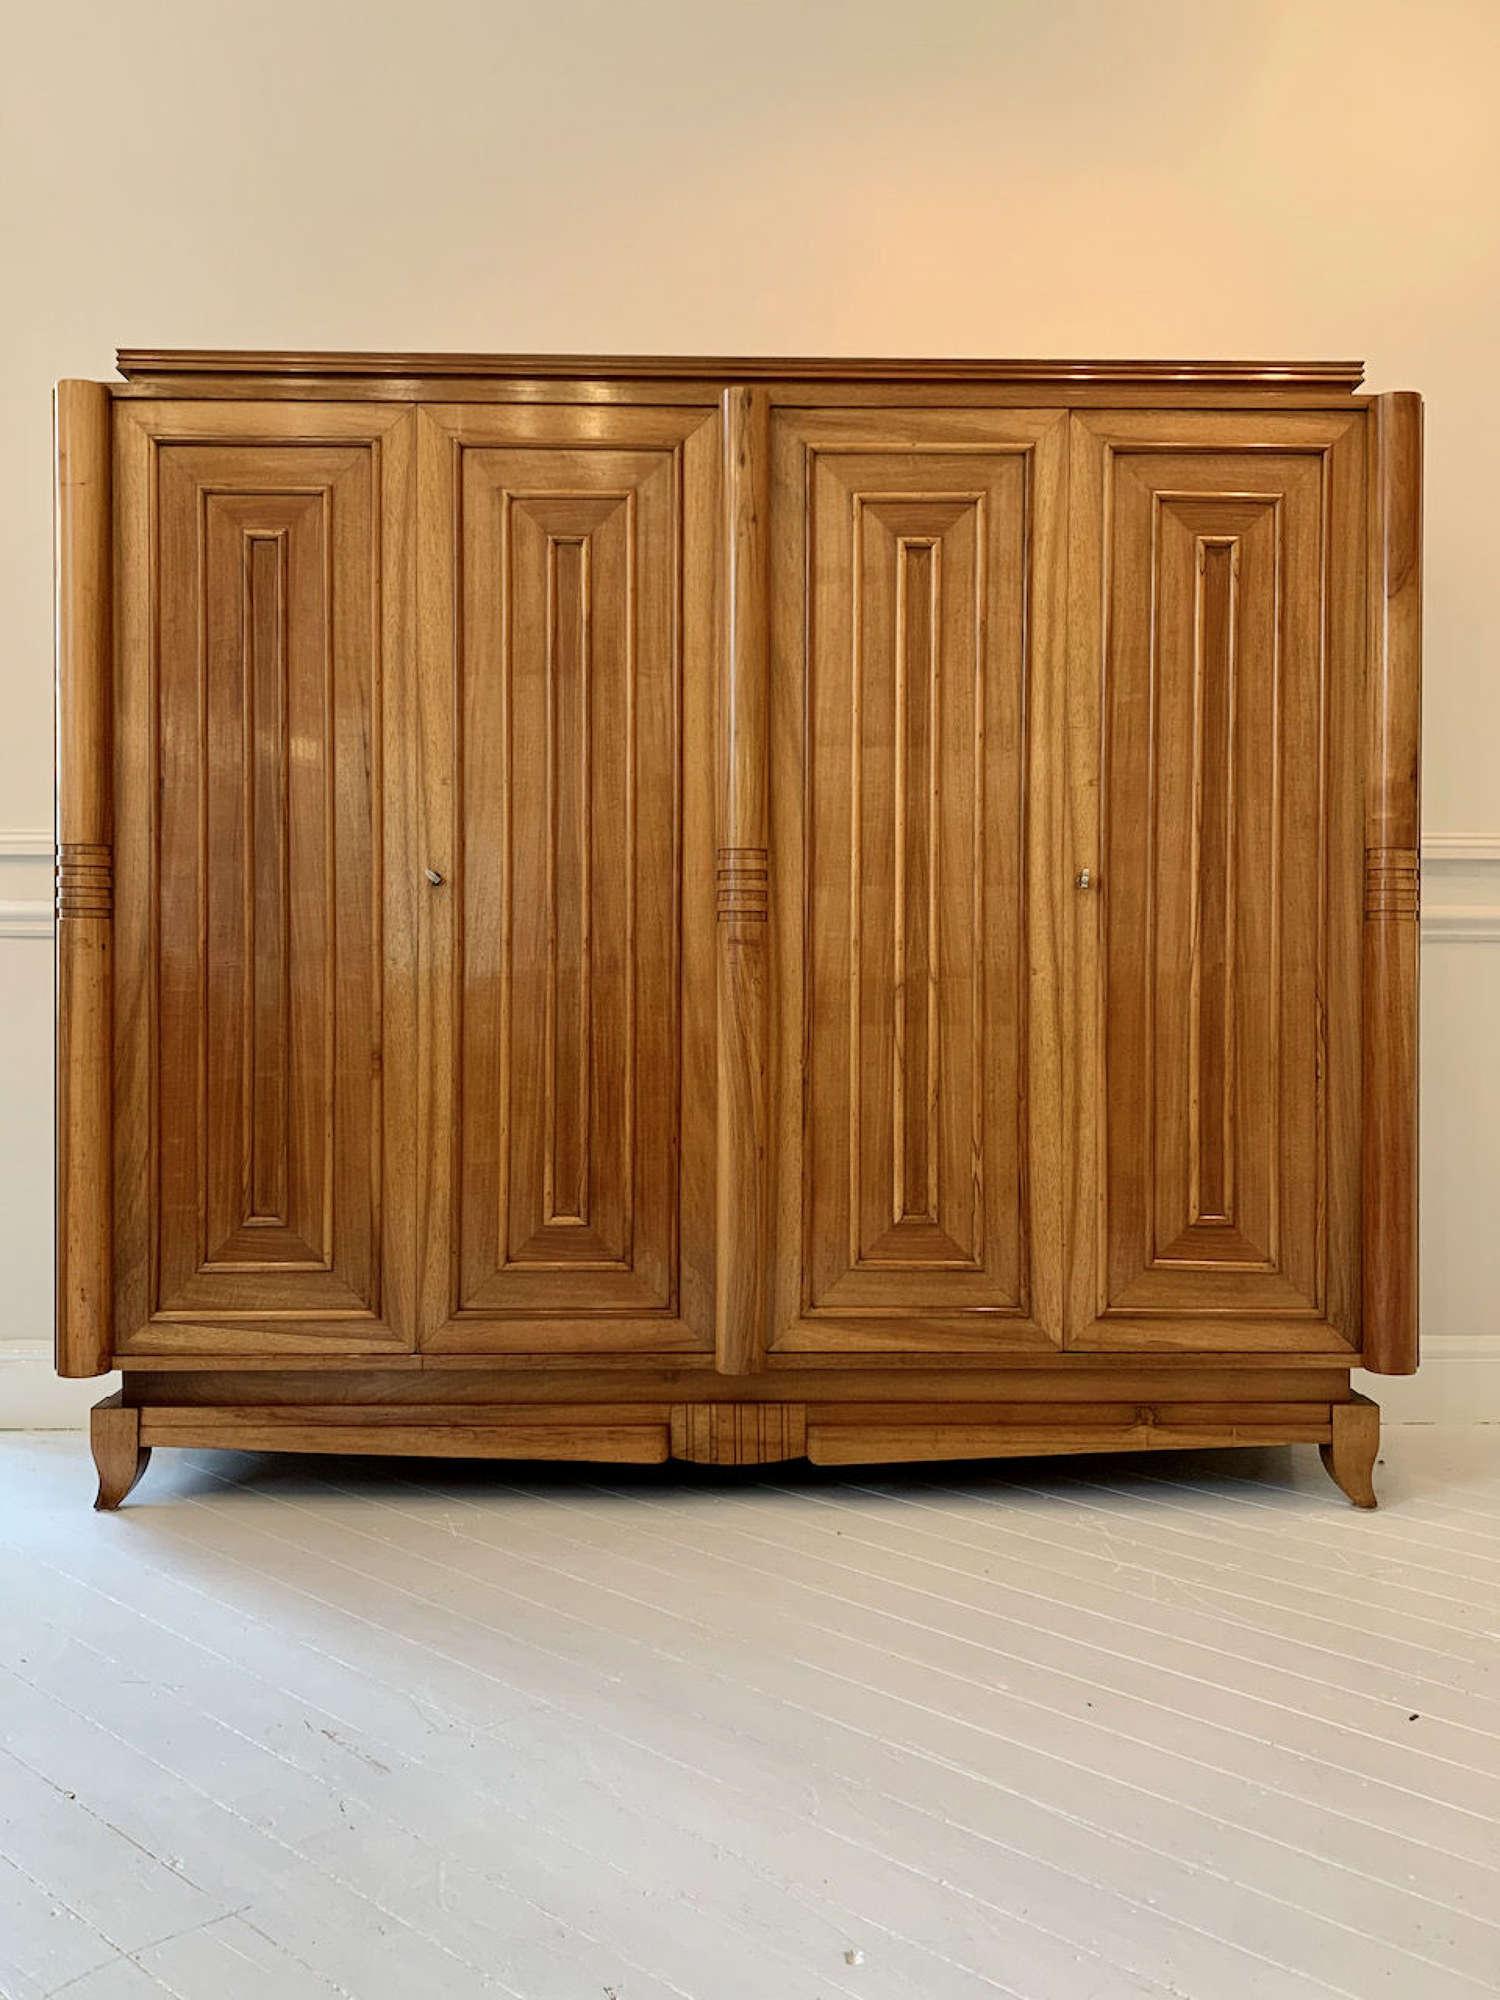 A sculptural Art Deco Walnut cupboard